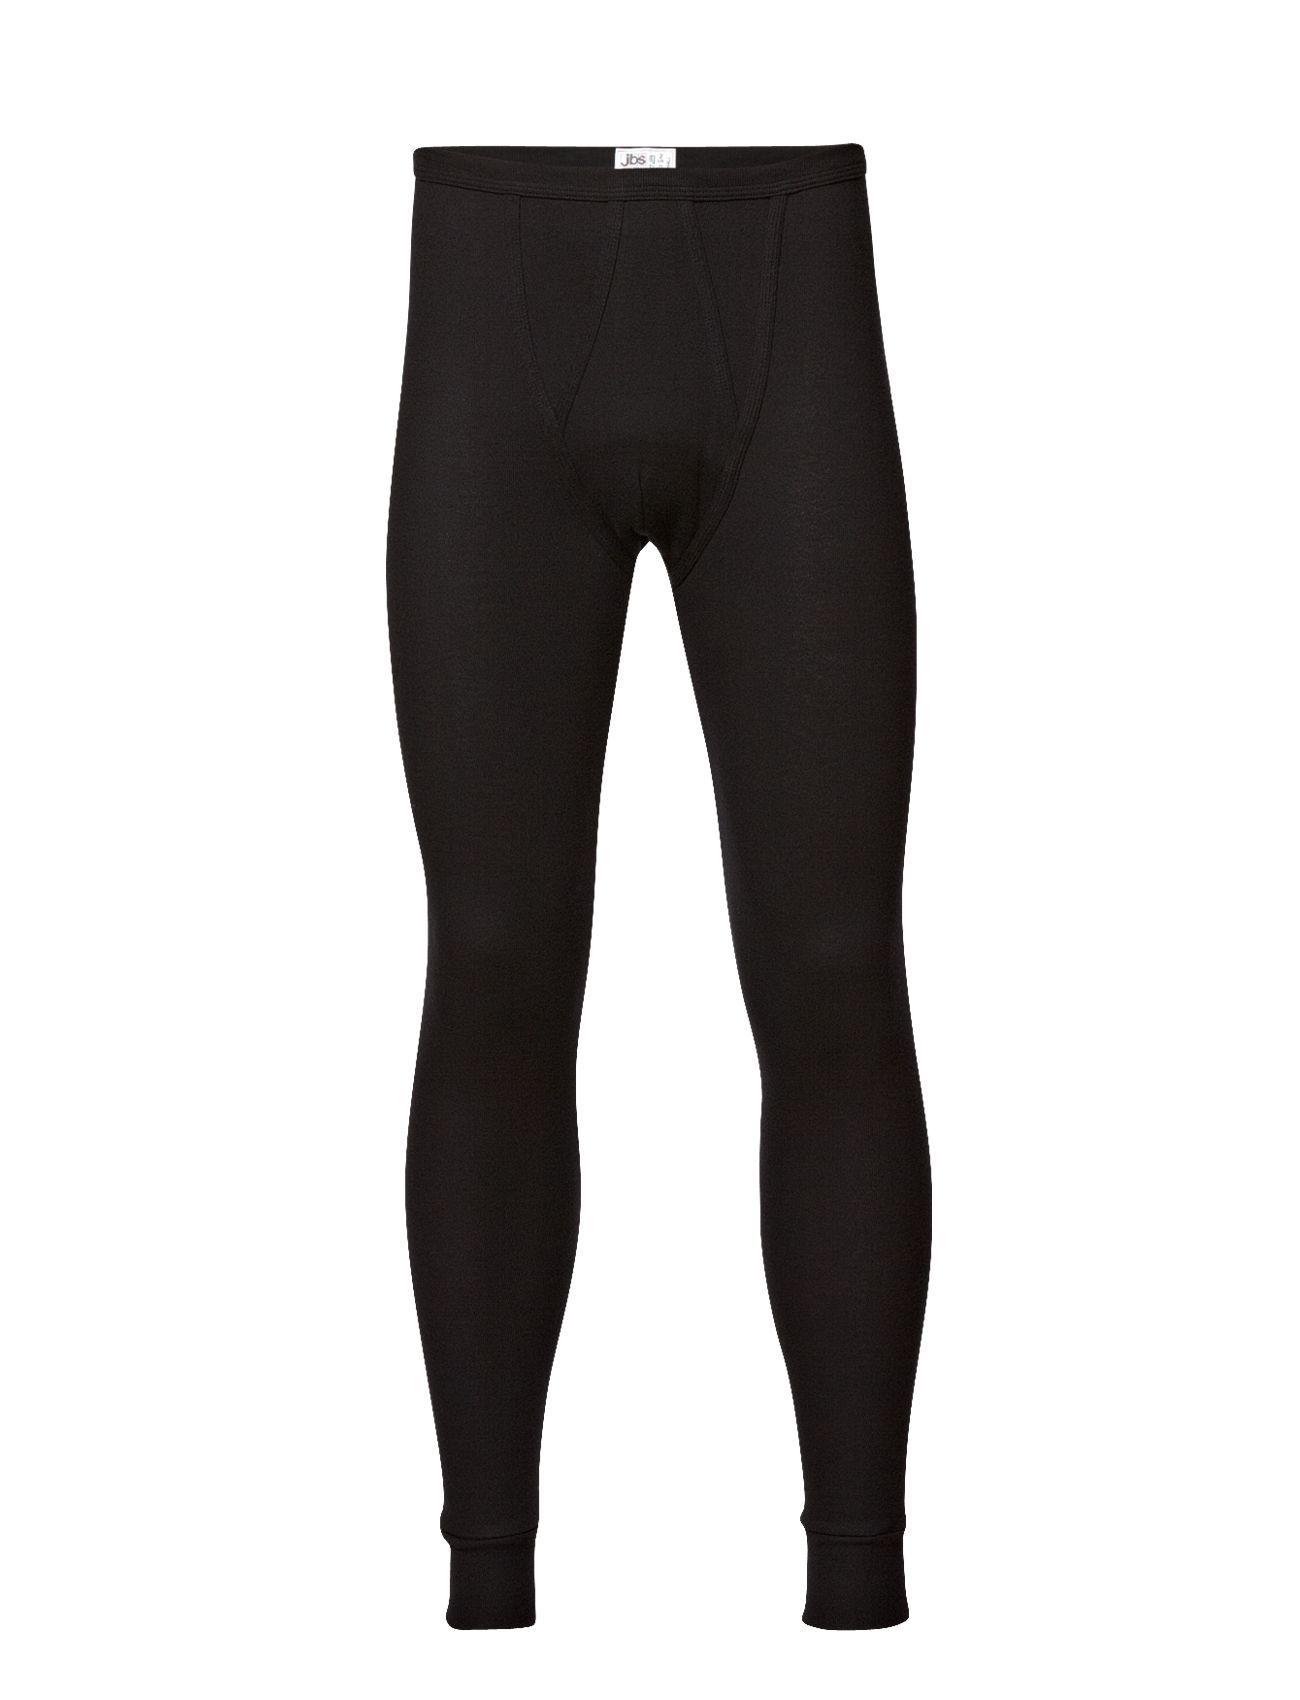 JBS Original long legs